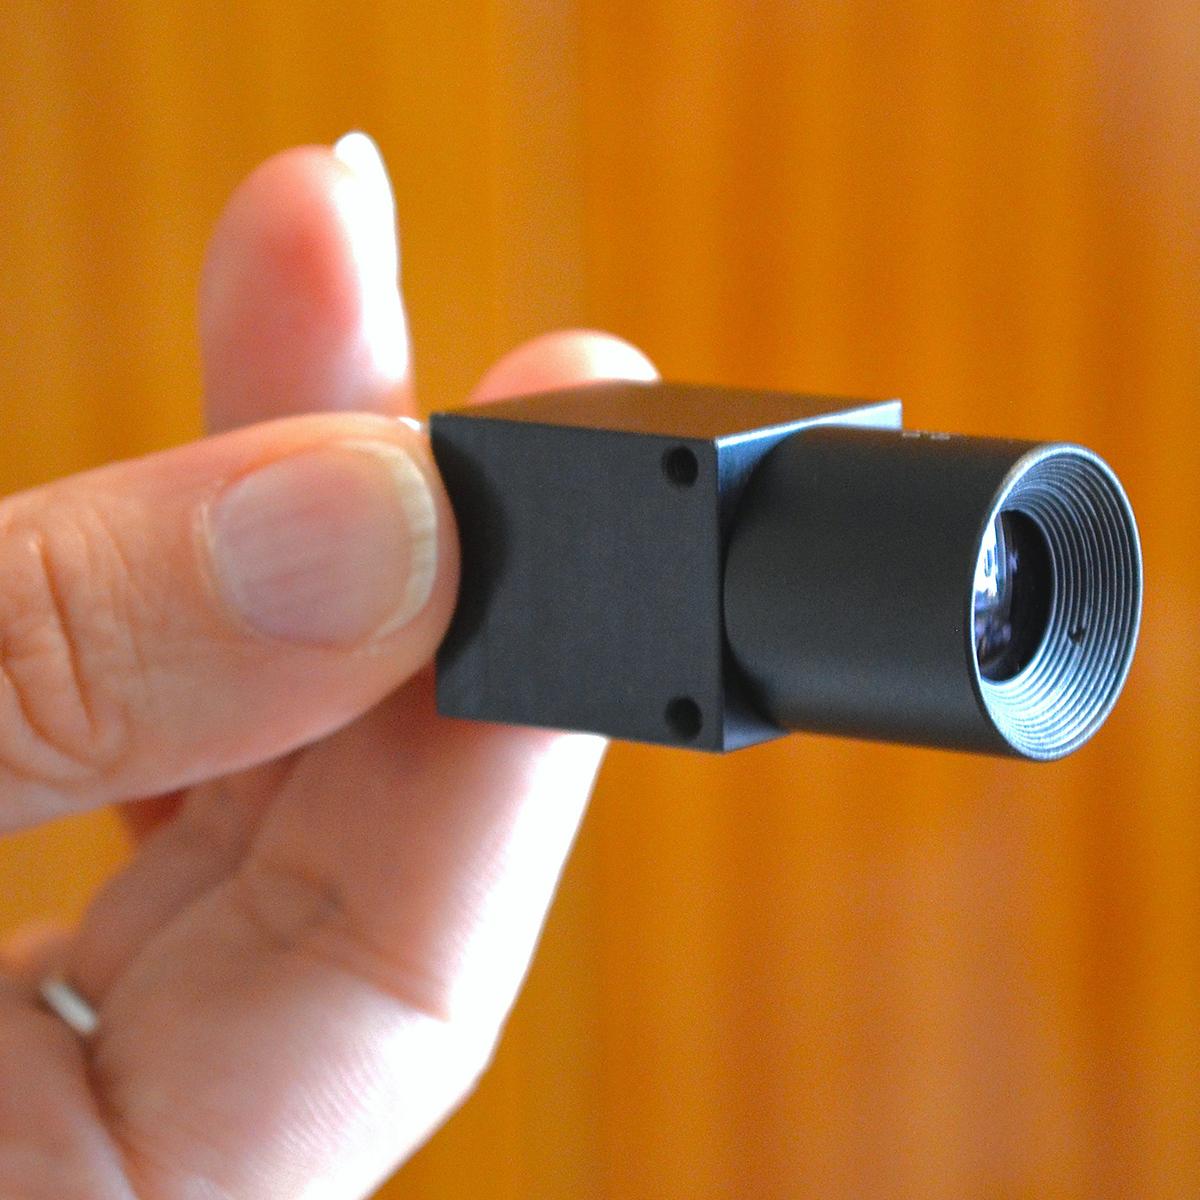 WVS-55 miniature welding camera in hand w. background